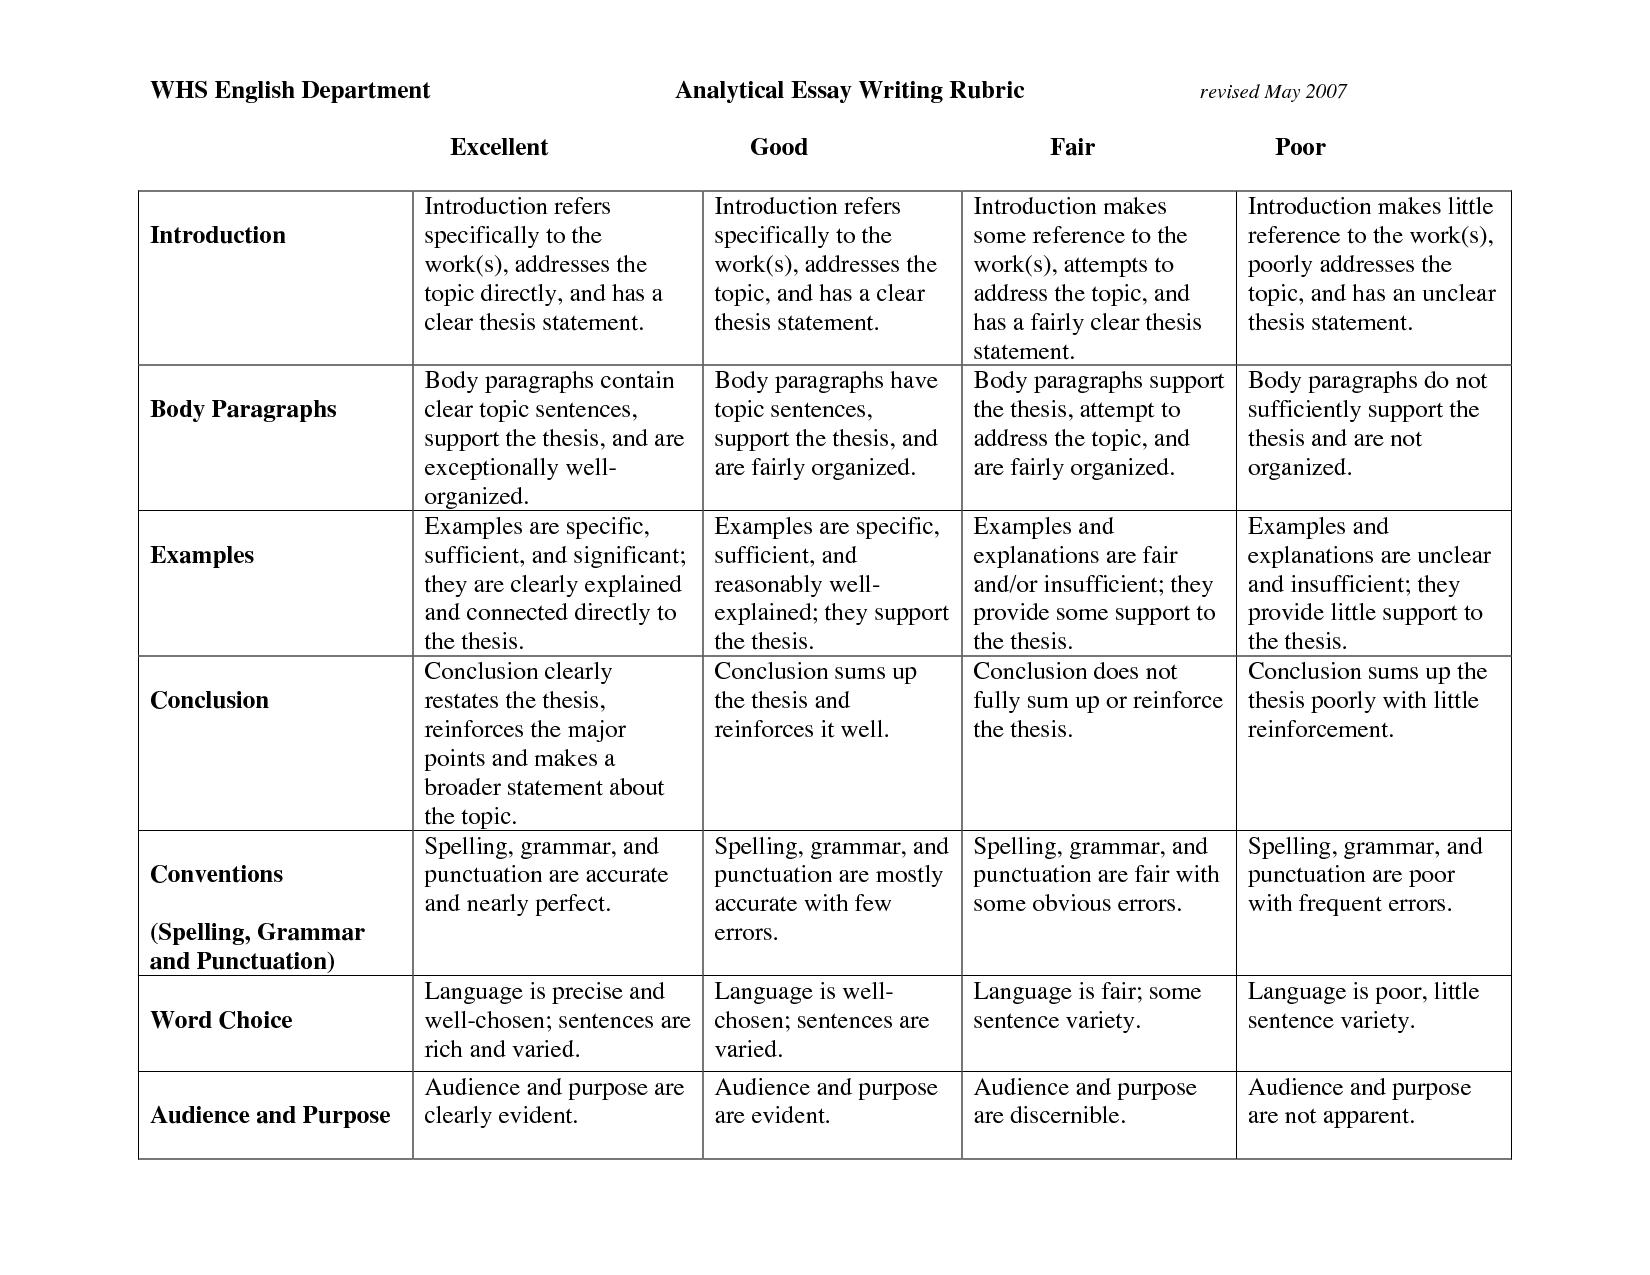 001 Essay Example Rubrics For Writing Rare Pdf Contest Full